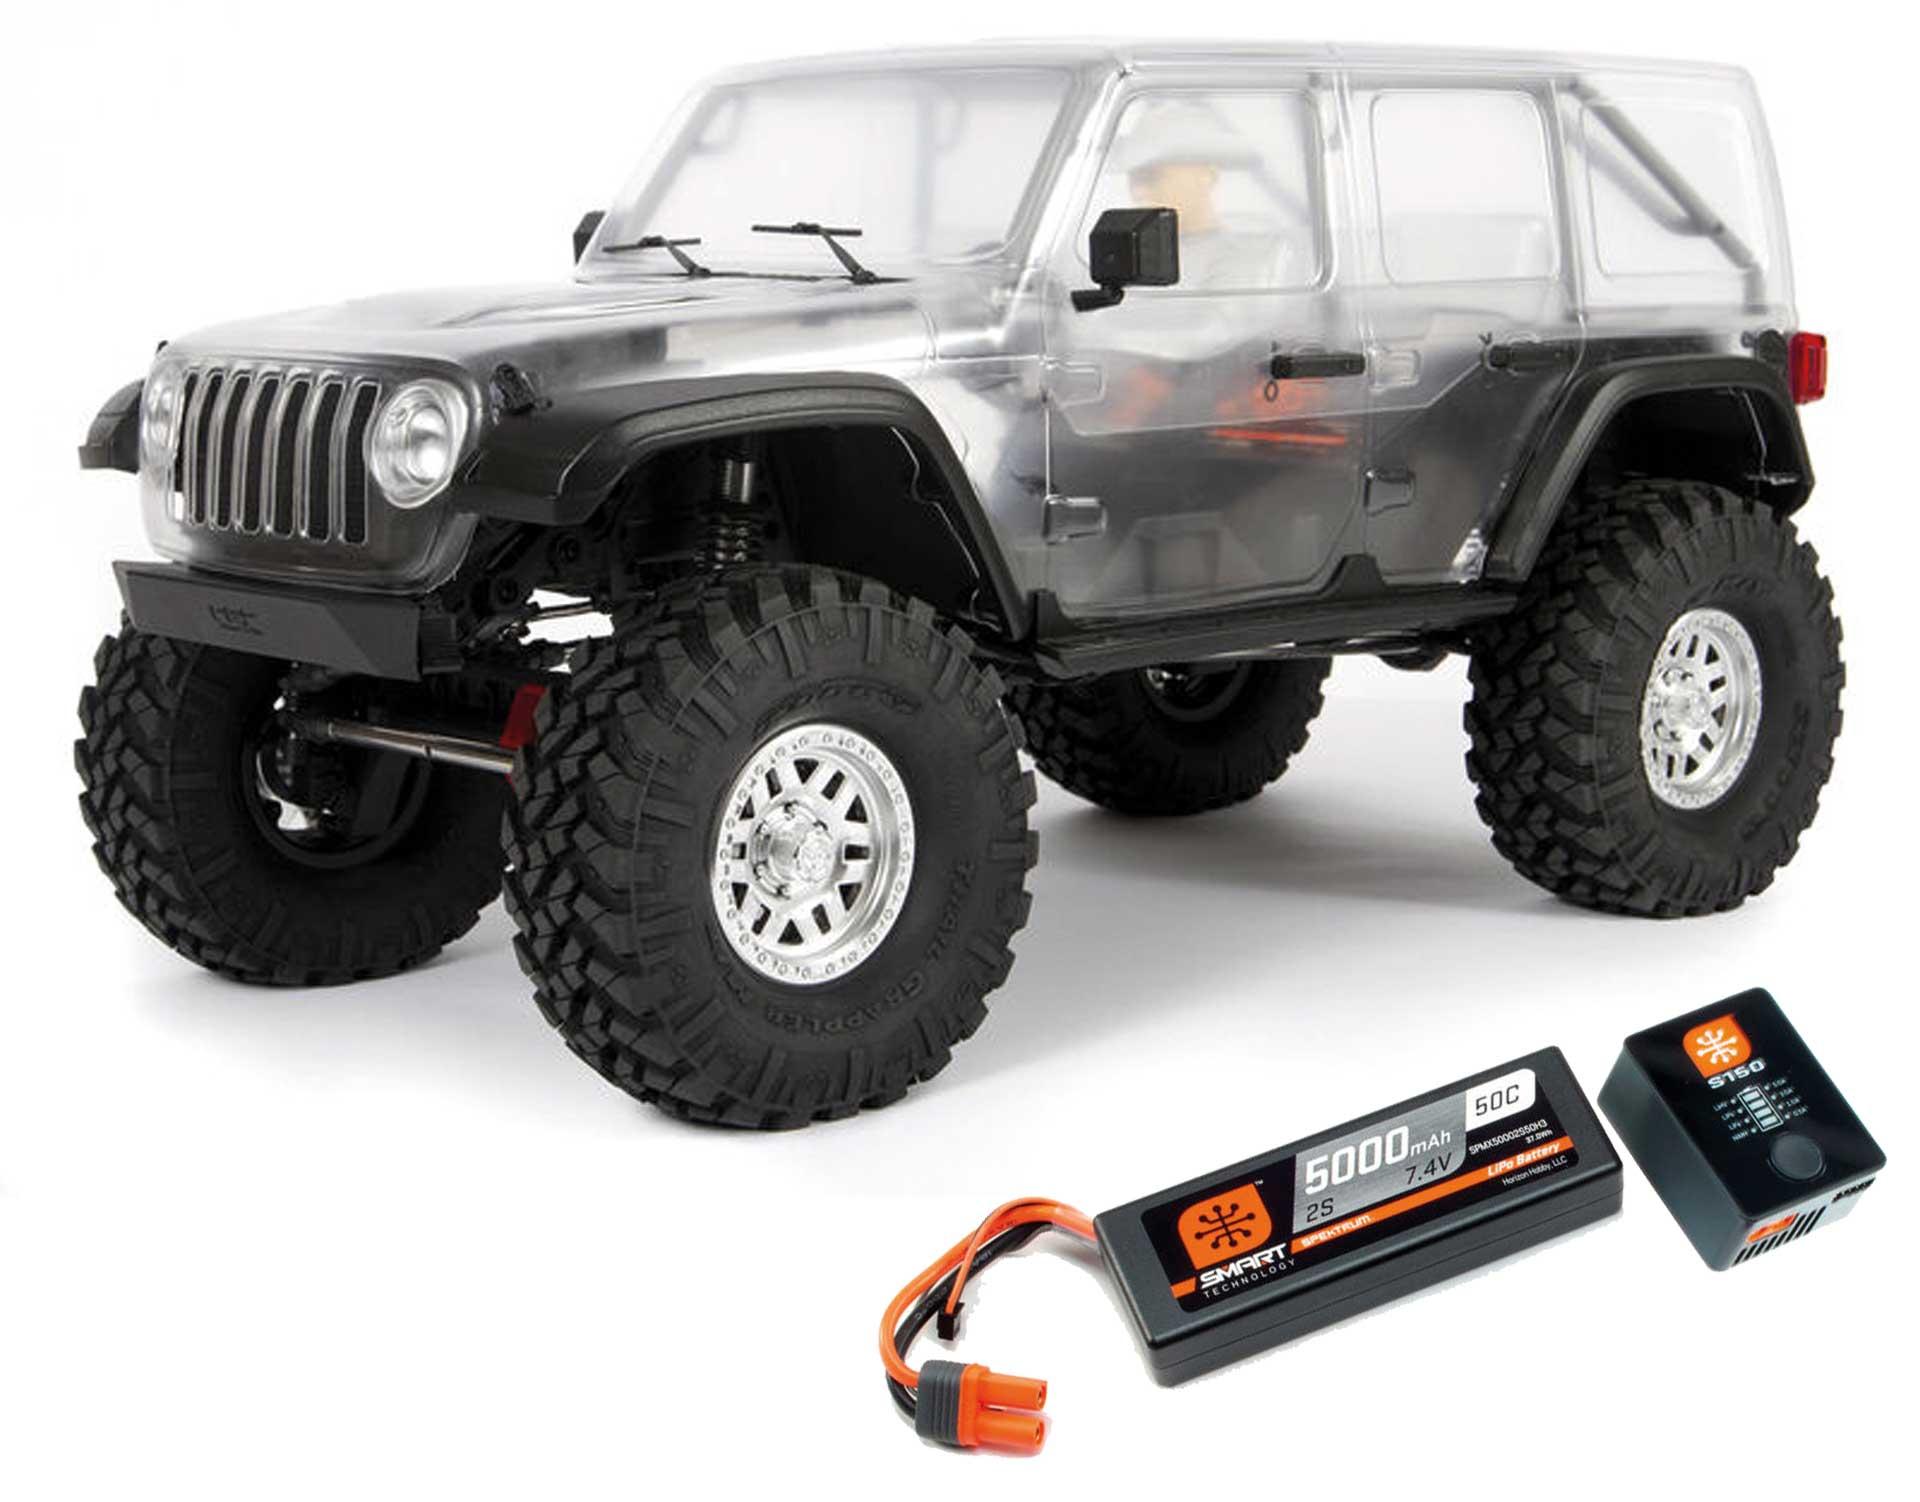 AXIAL SCX10III Jeep JLU Wrangler mit Portalachsen 1/10 4WD Kit + Spektrum 2S Powerstage-Bundle